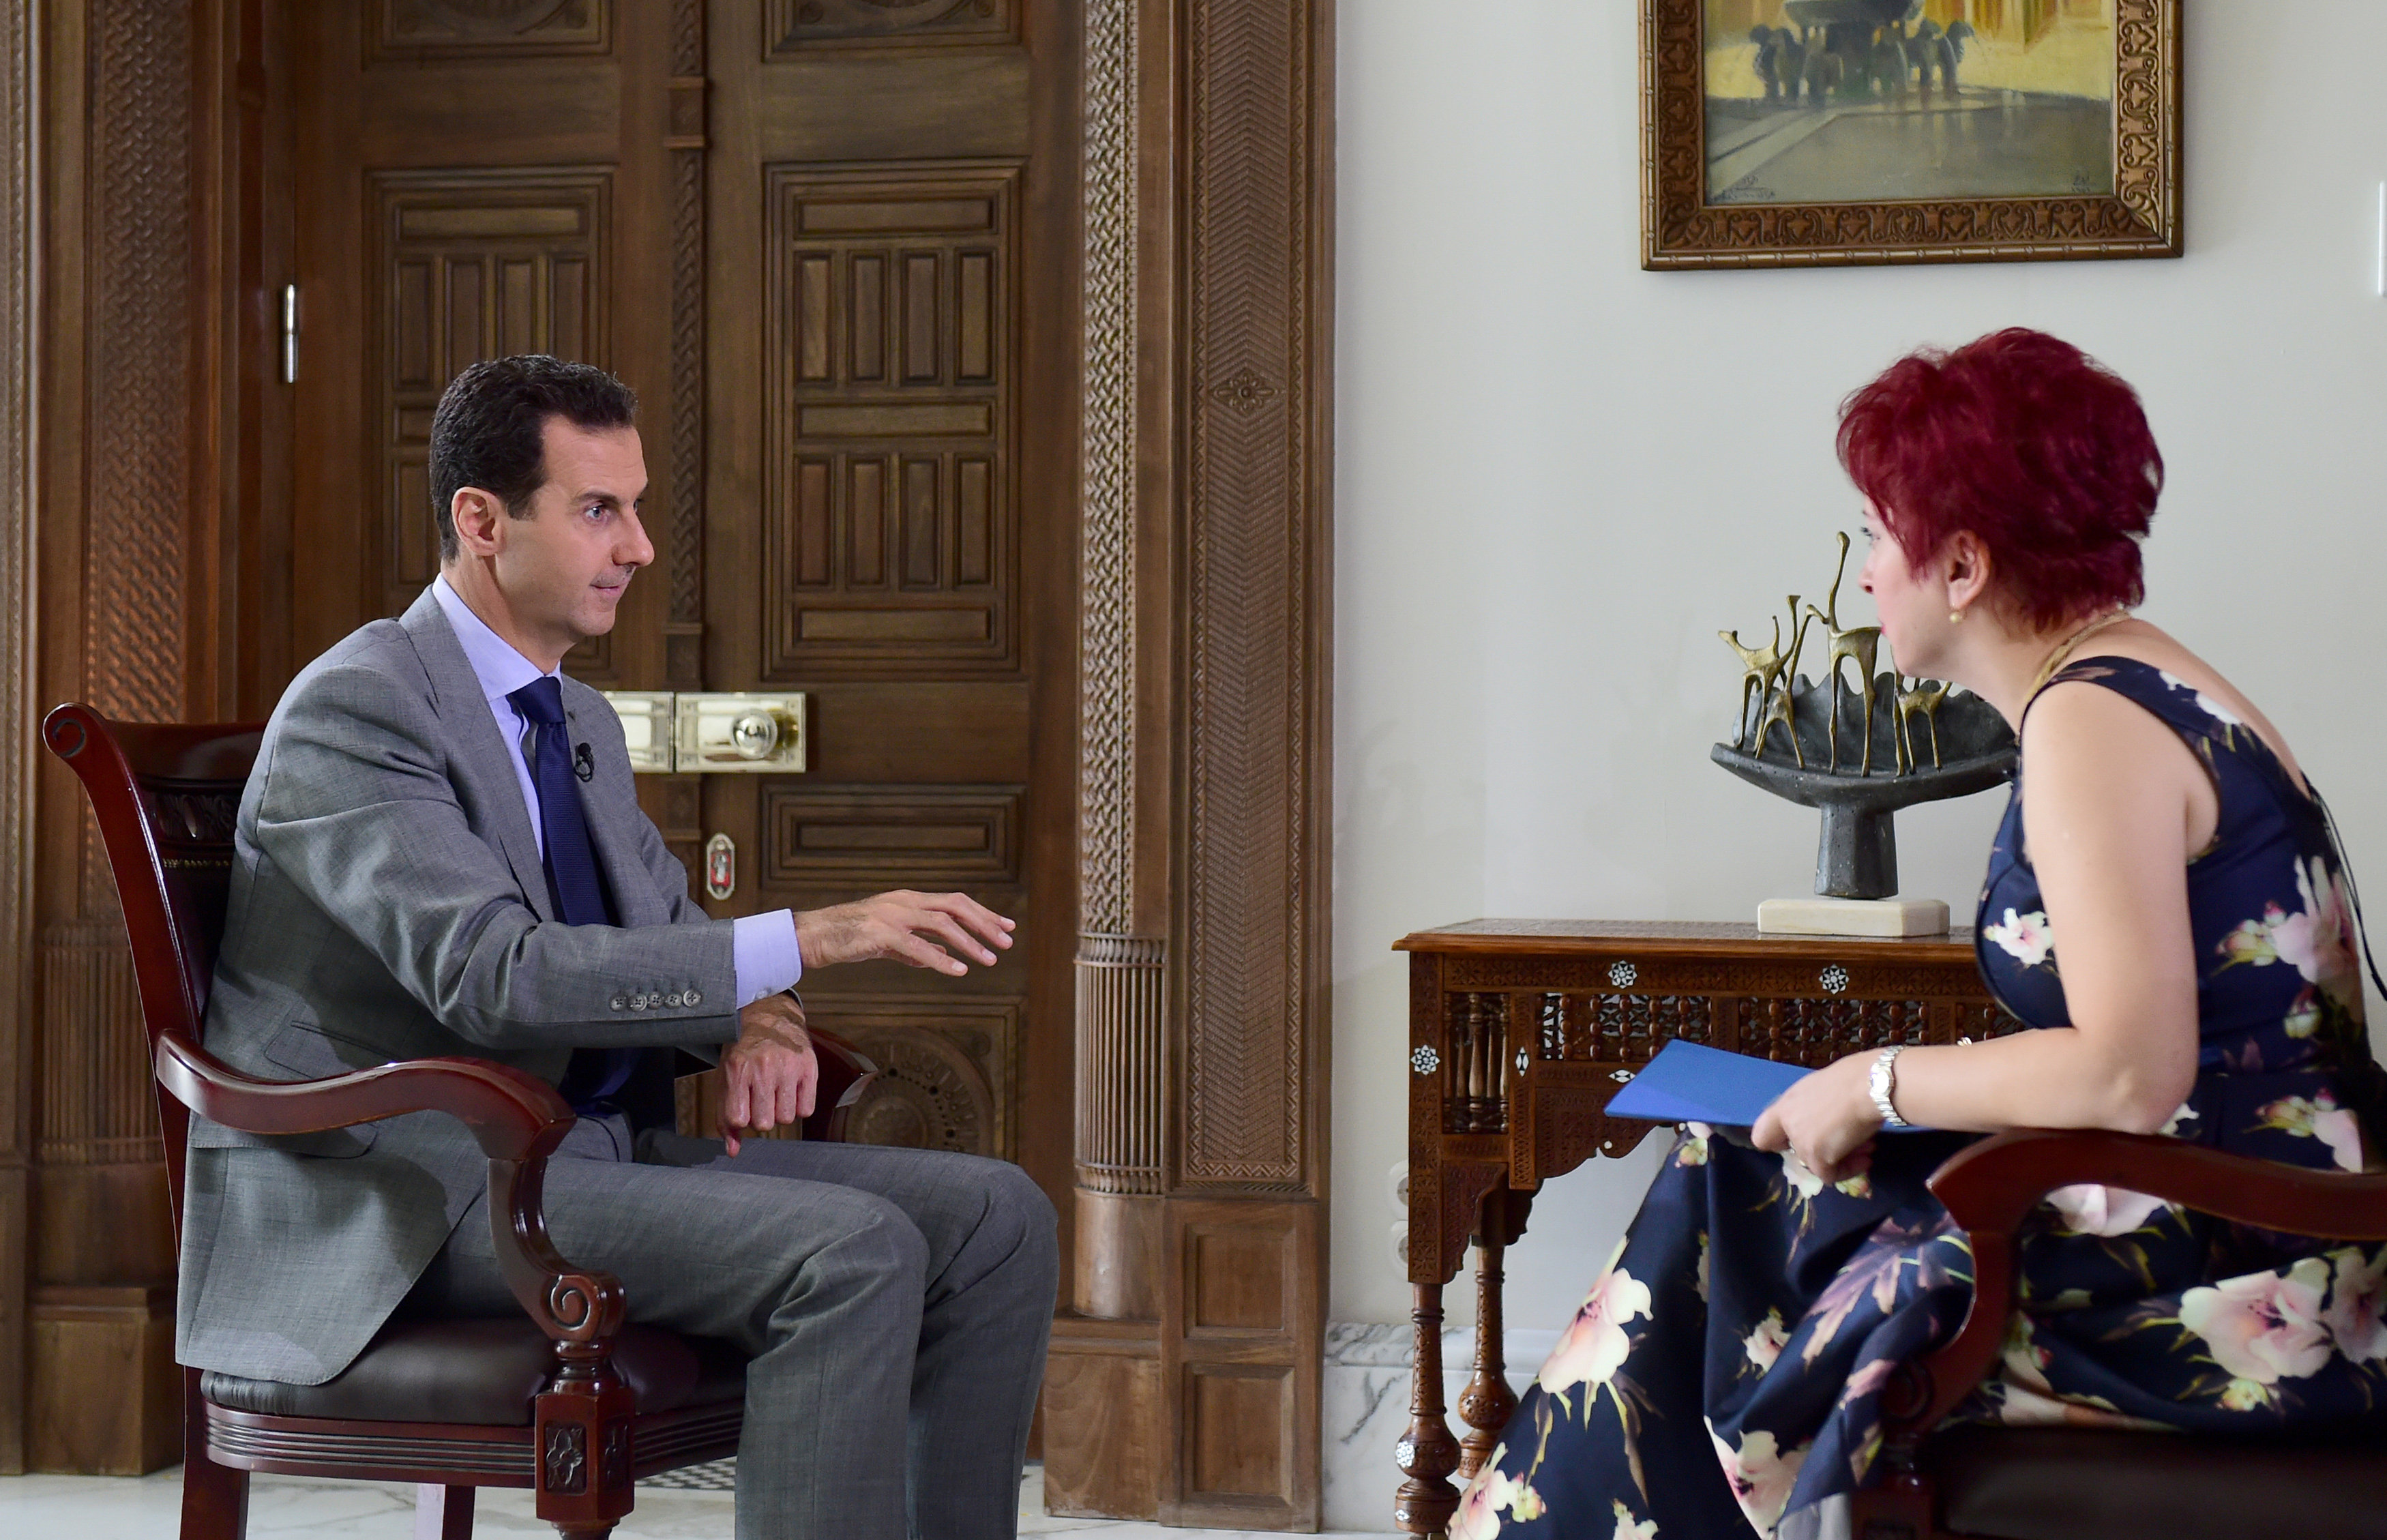 Assad Pravda 2016 10 14T075207Z 1424334789 S1BEUGWSHZAA RTRMADP 3 MIDEAST CRISIS SYRIA ASSAD